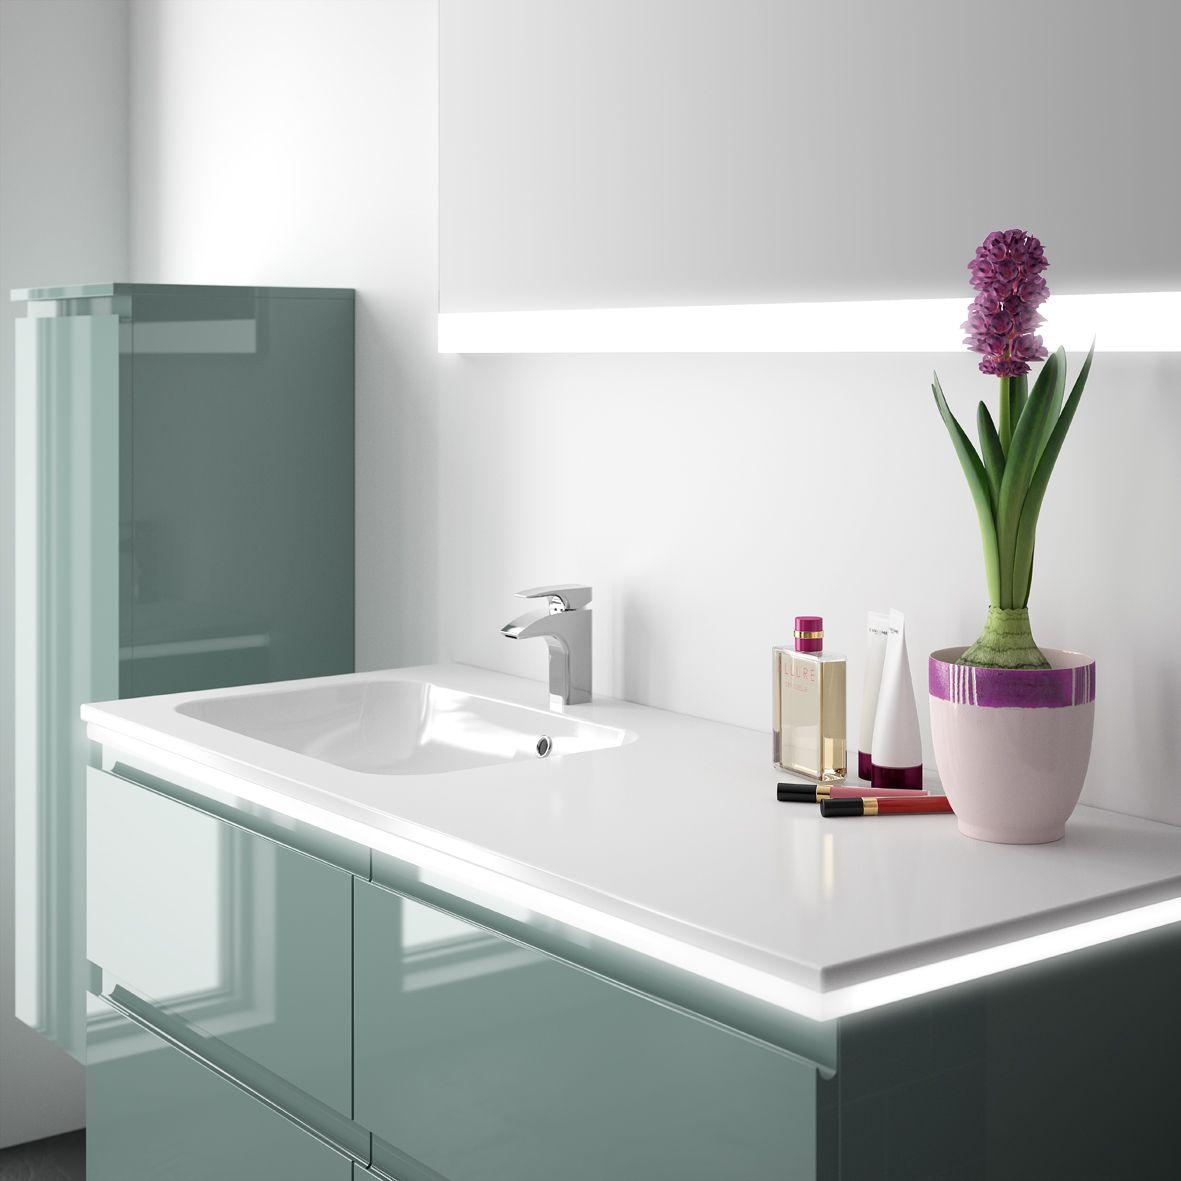 Plan vasque en marbre reconstitué brillant disponible en mat Cedam